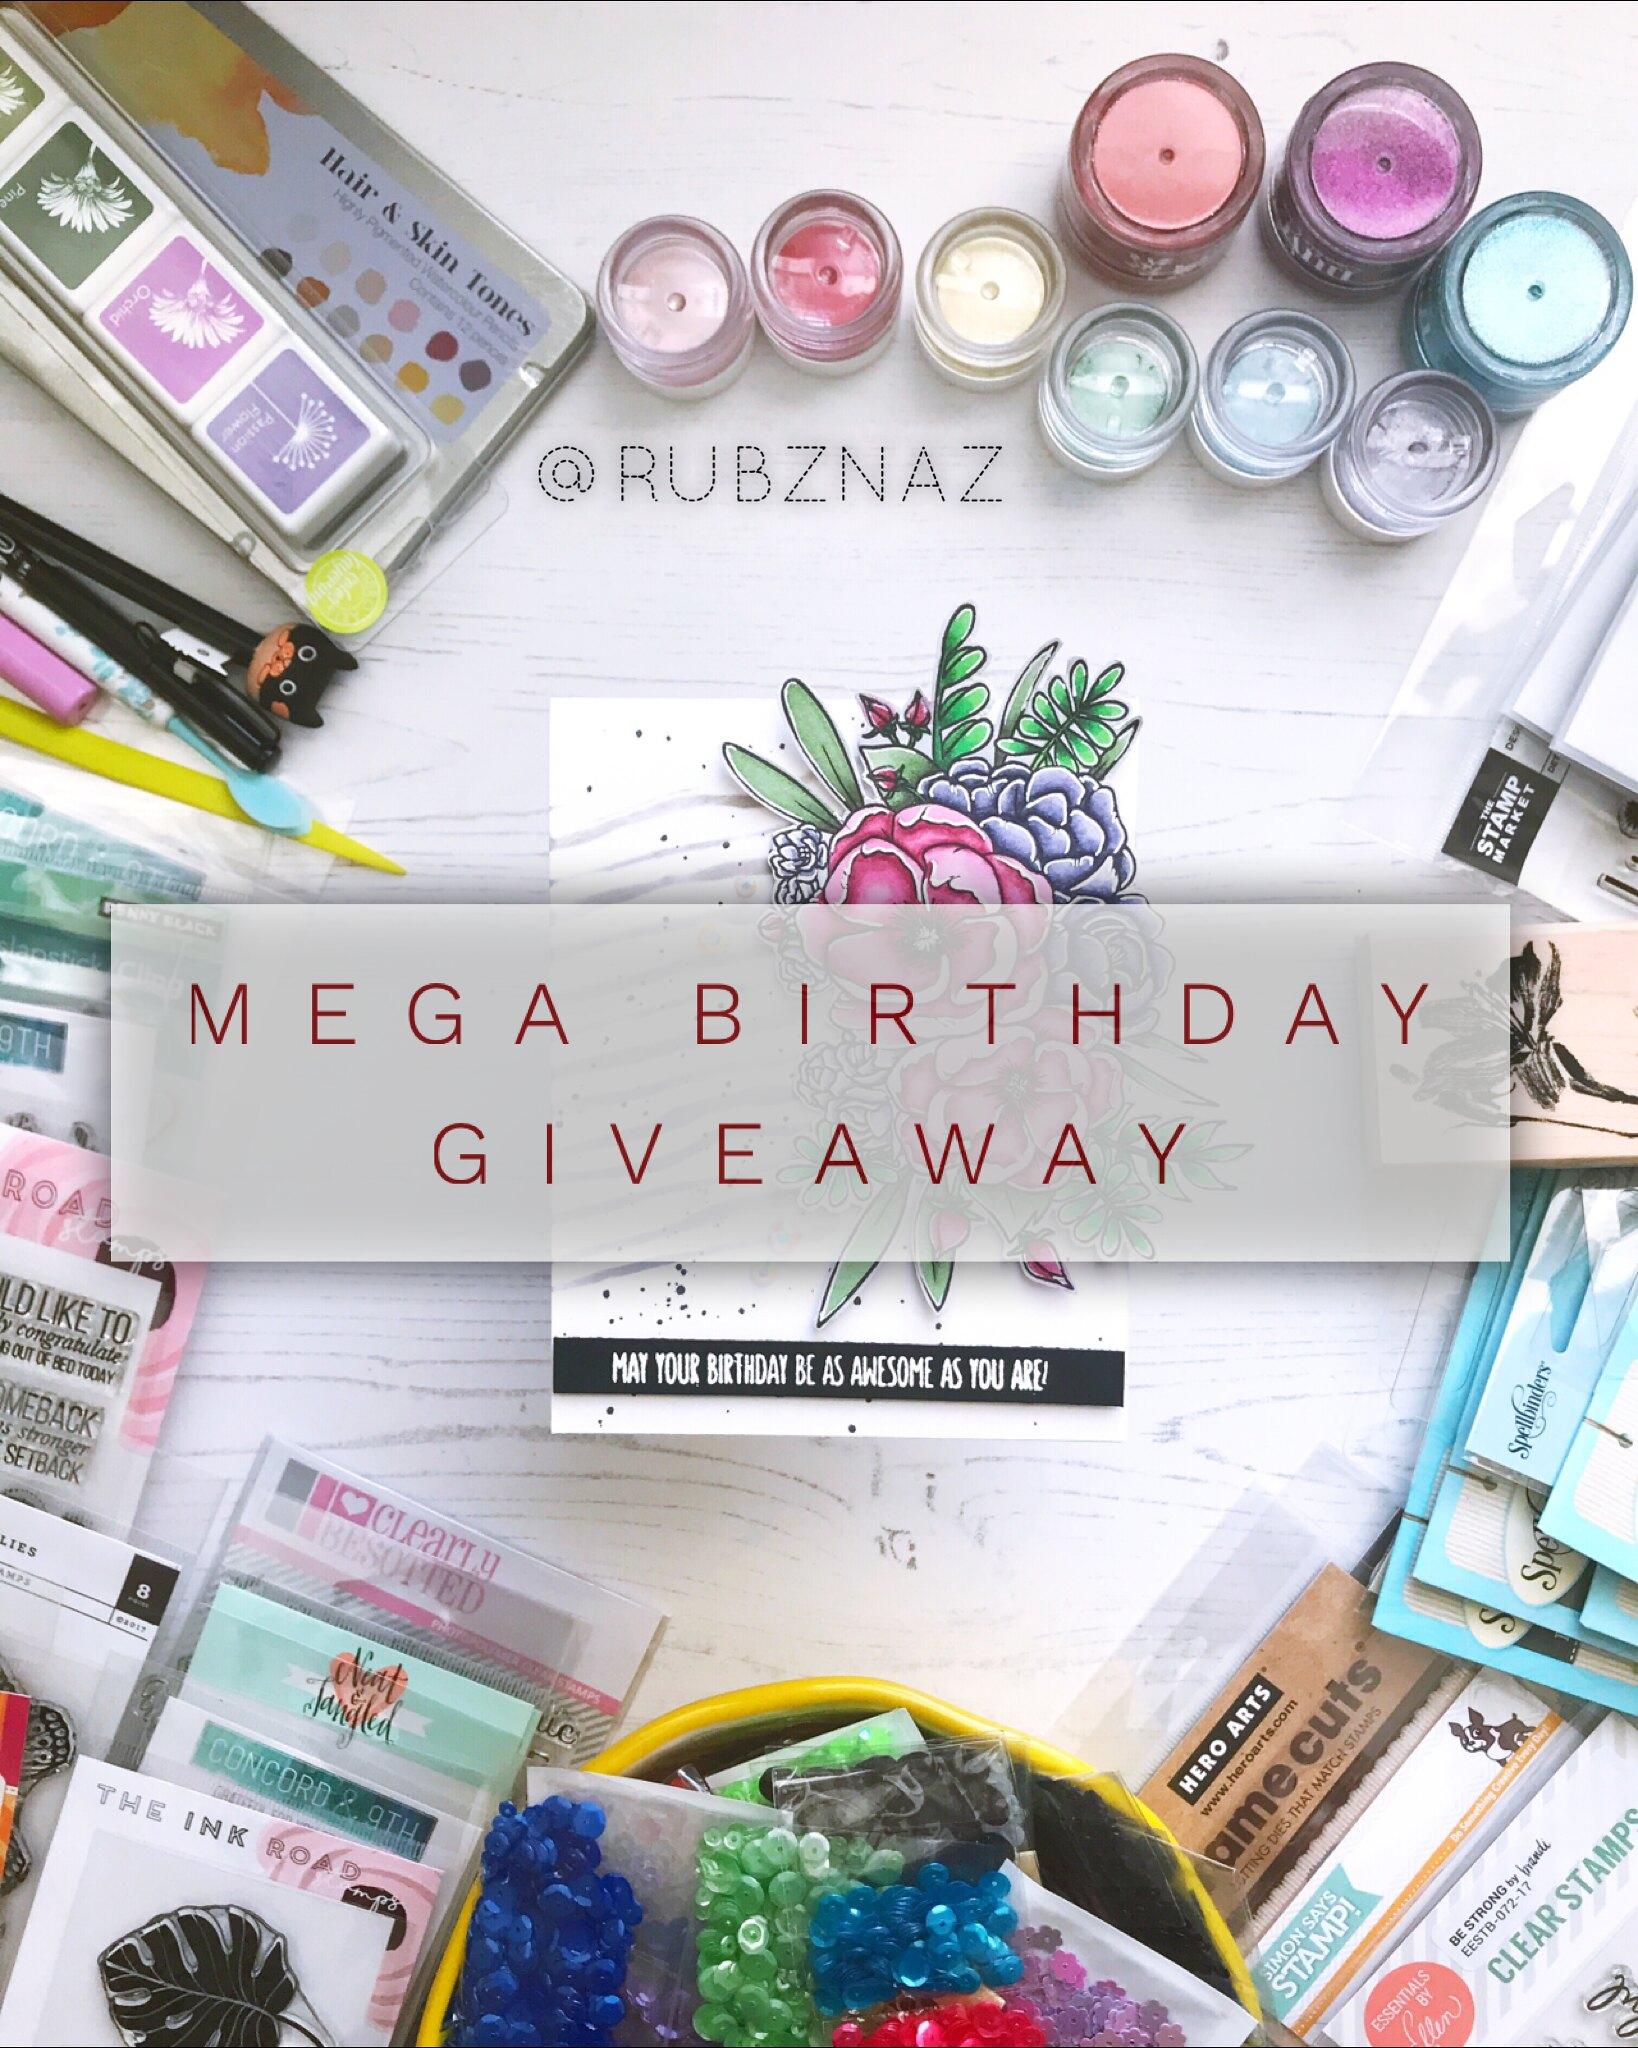 @rubznaz Mega Birthday Giveaway